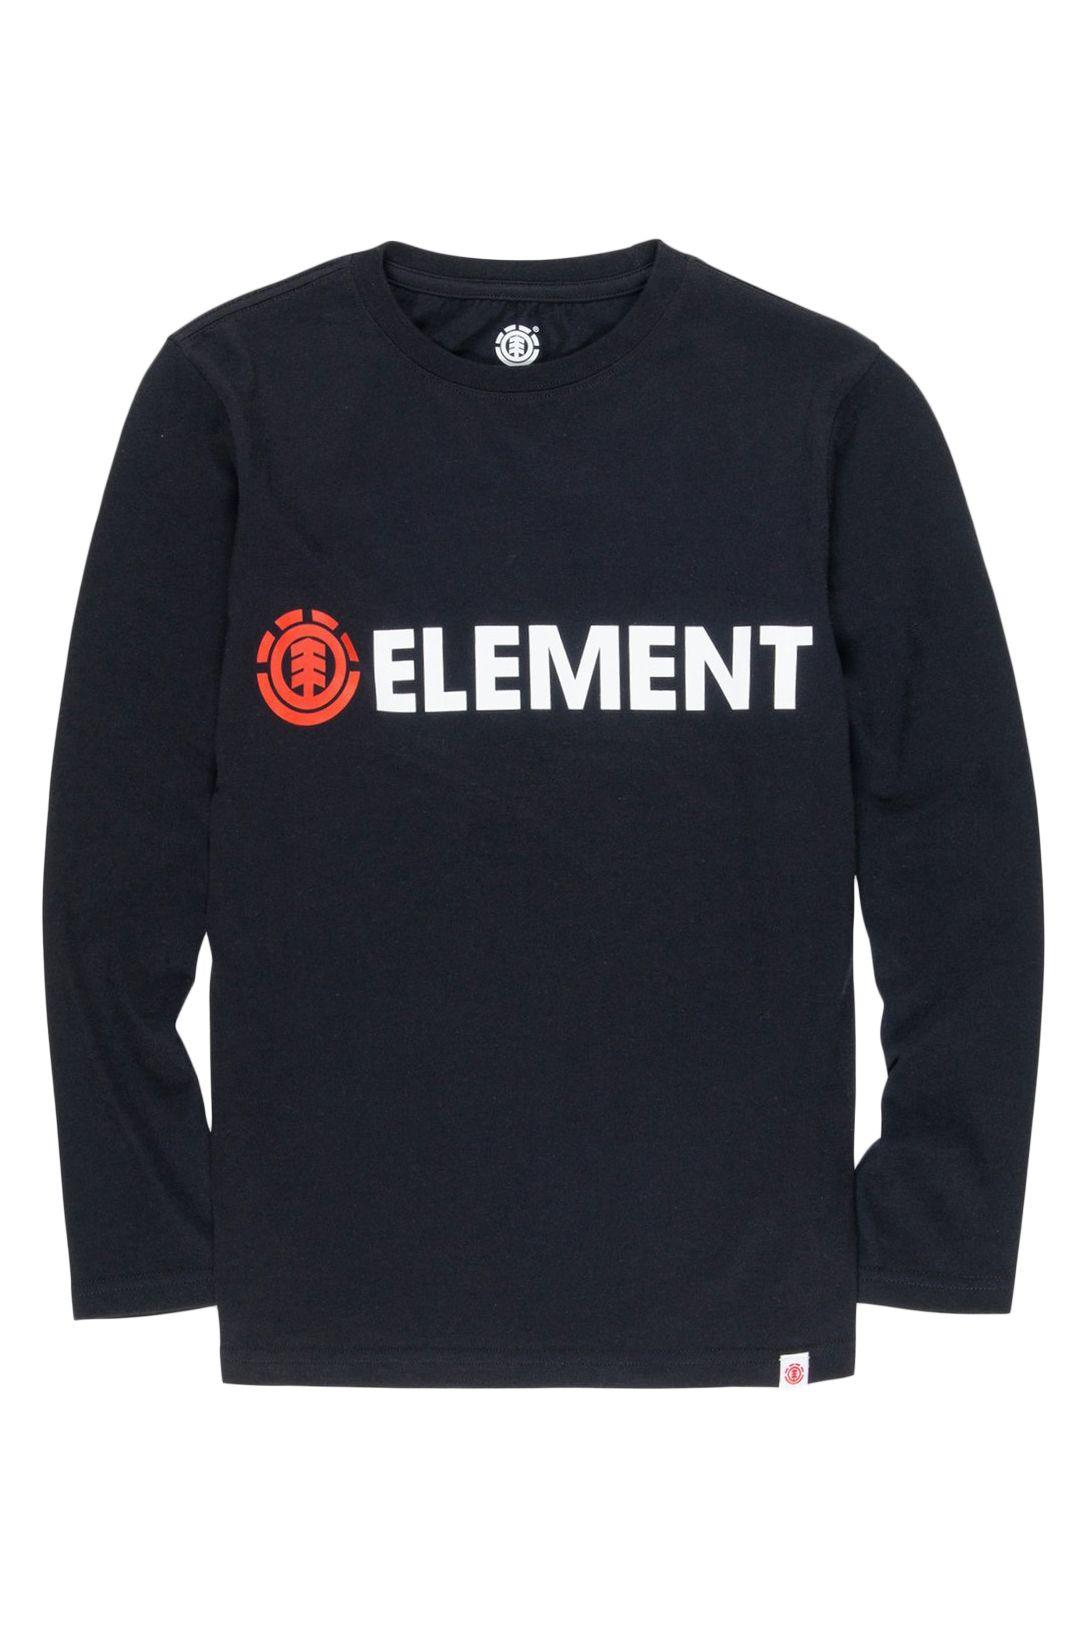 L-Sleeve Element BLAZIN LS BOY Flint Black